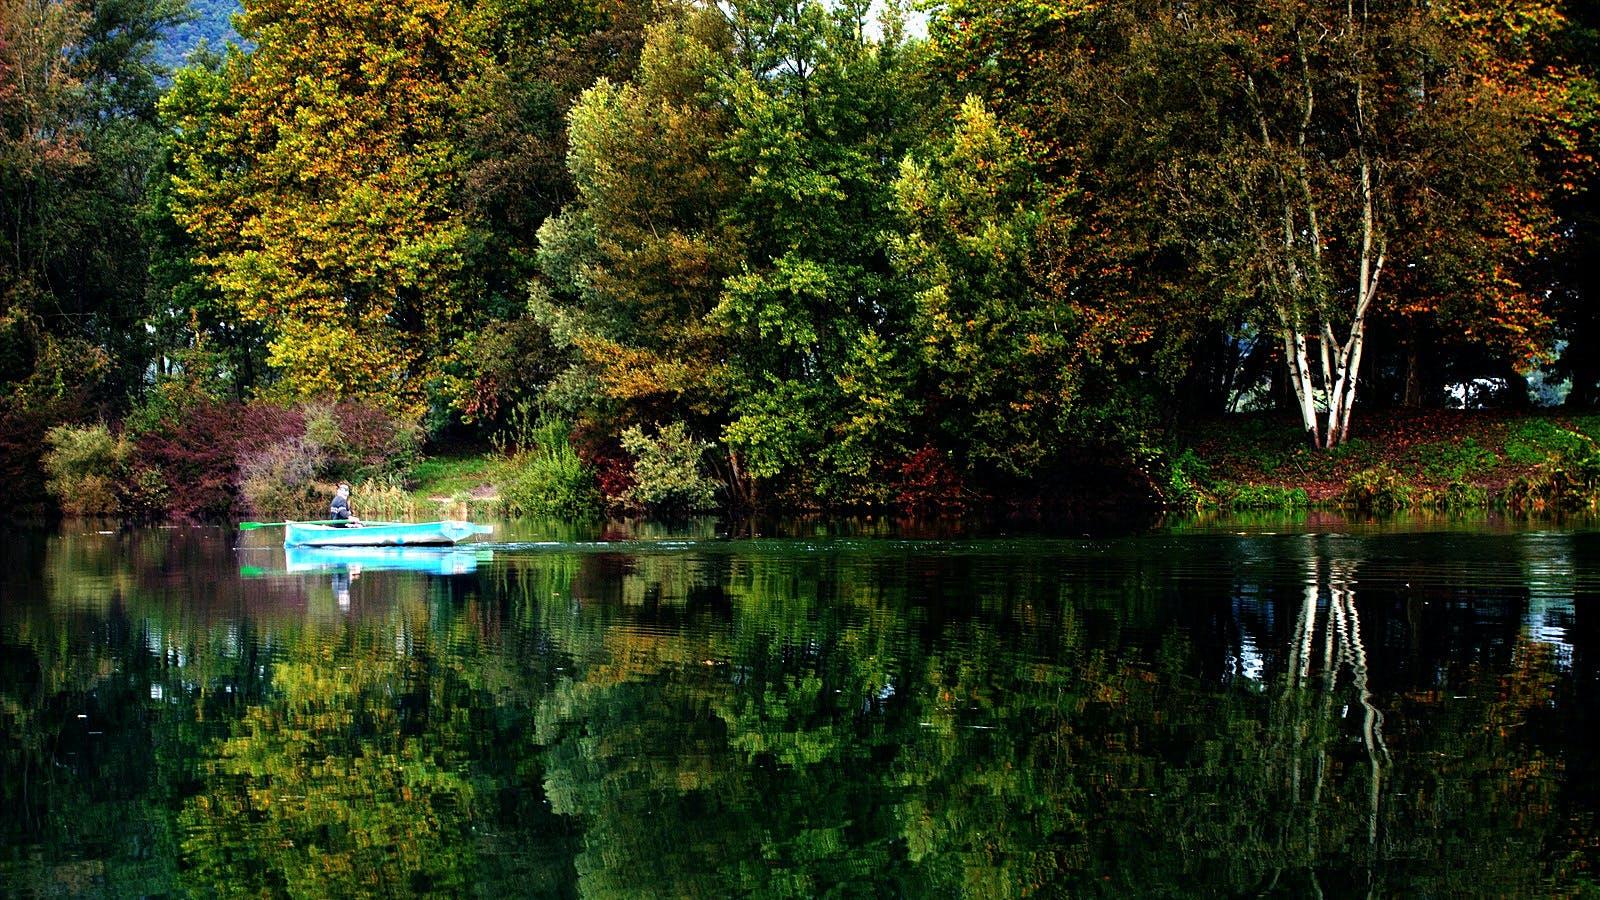 Kostenloses Stock Foto zu bäume, draußen, fluss, landschaft